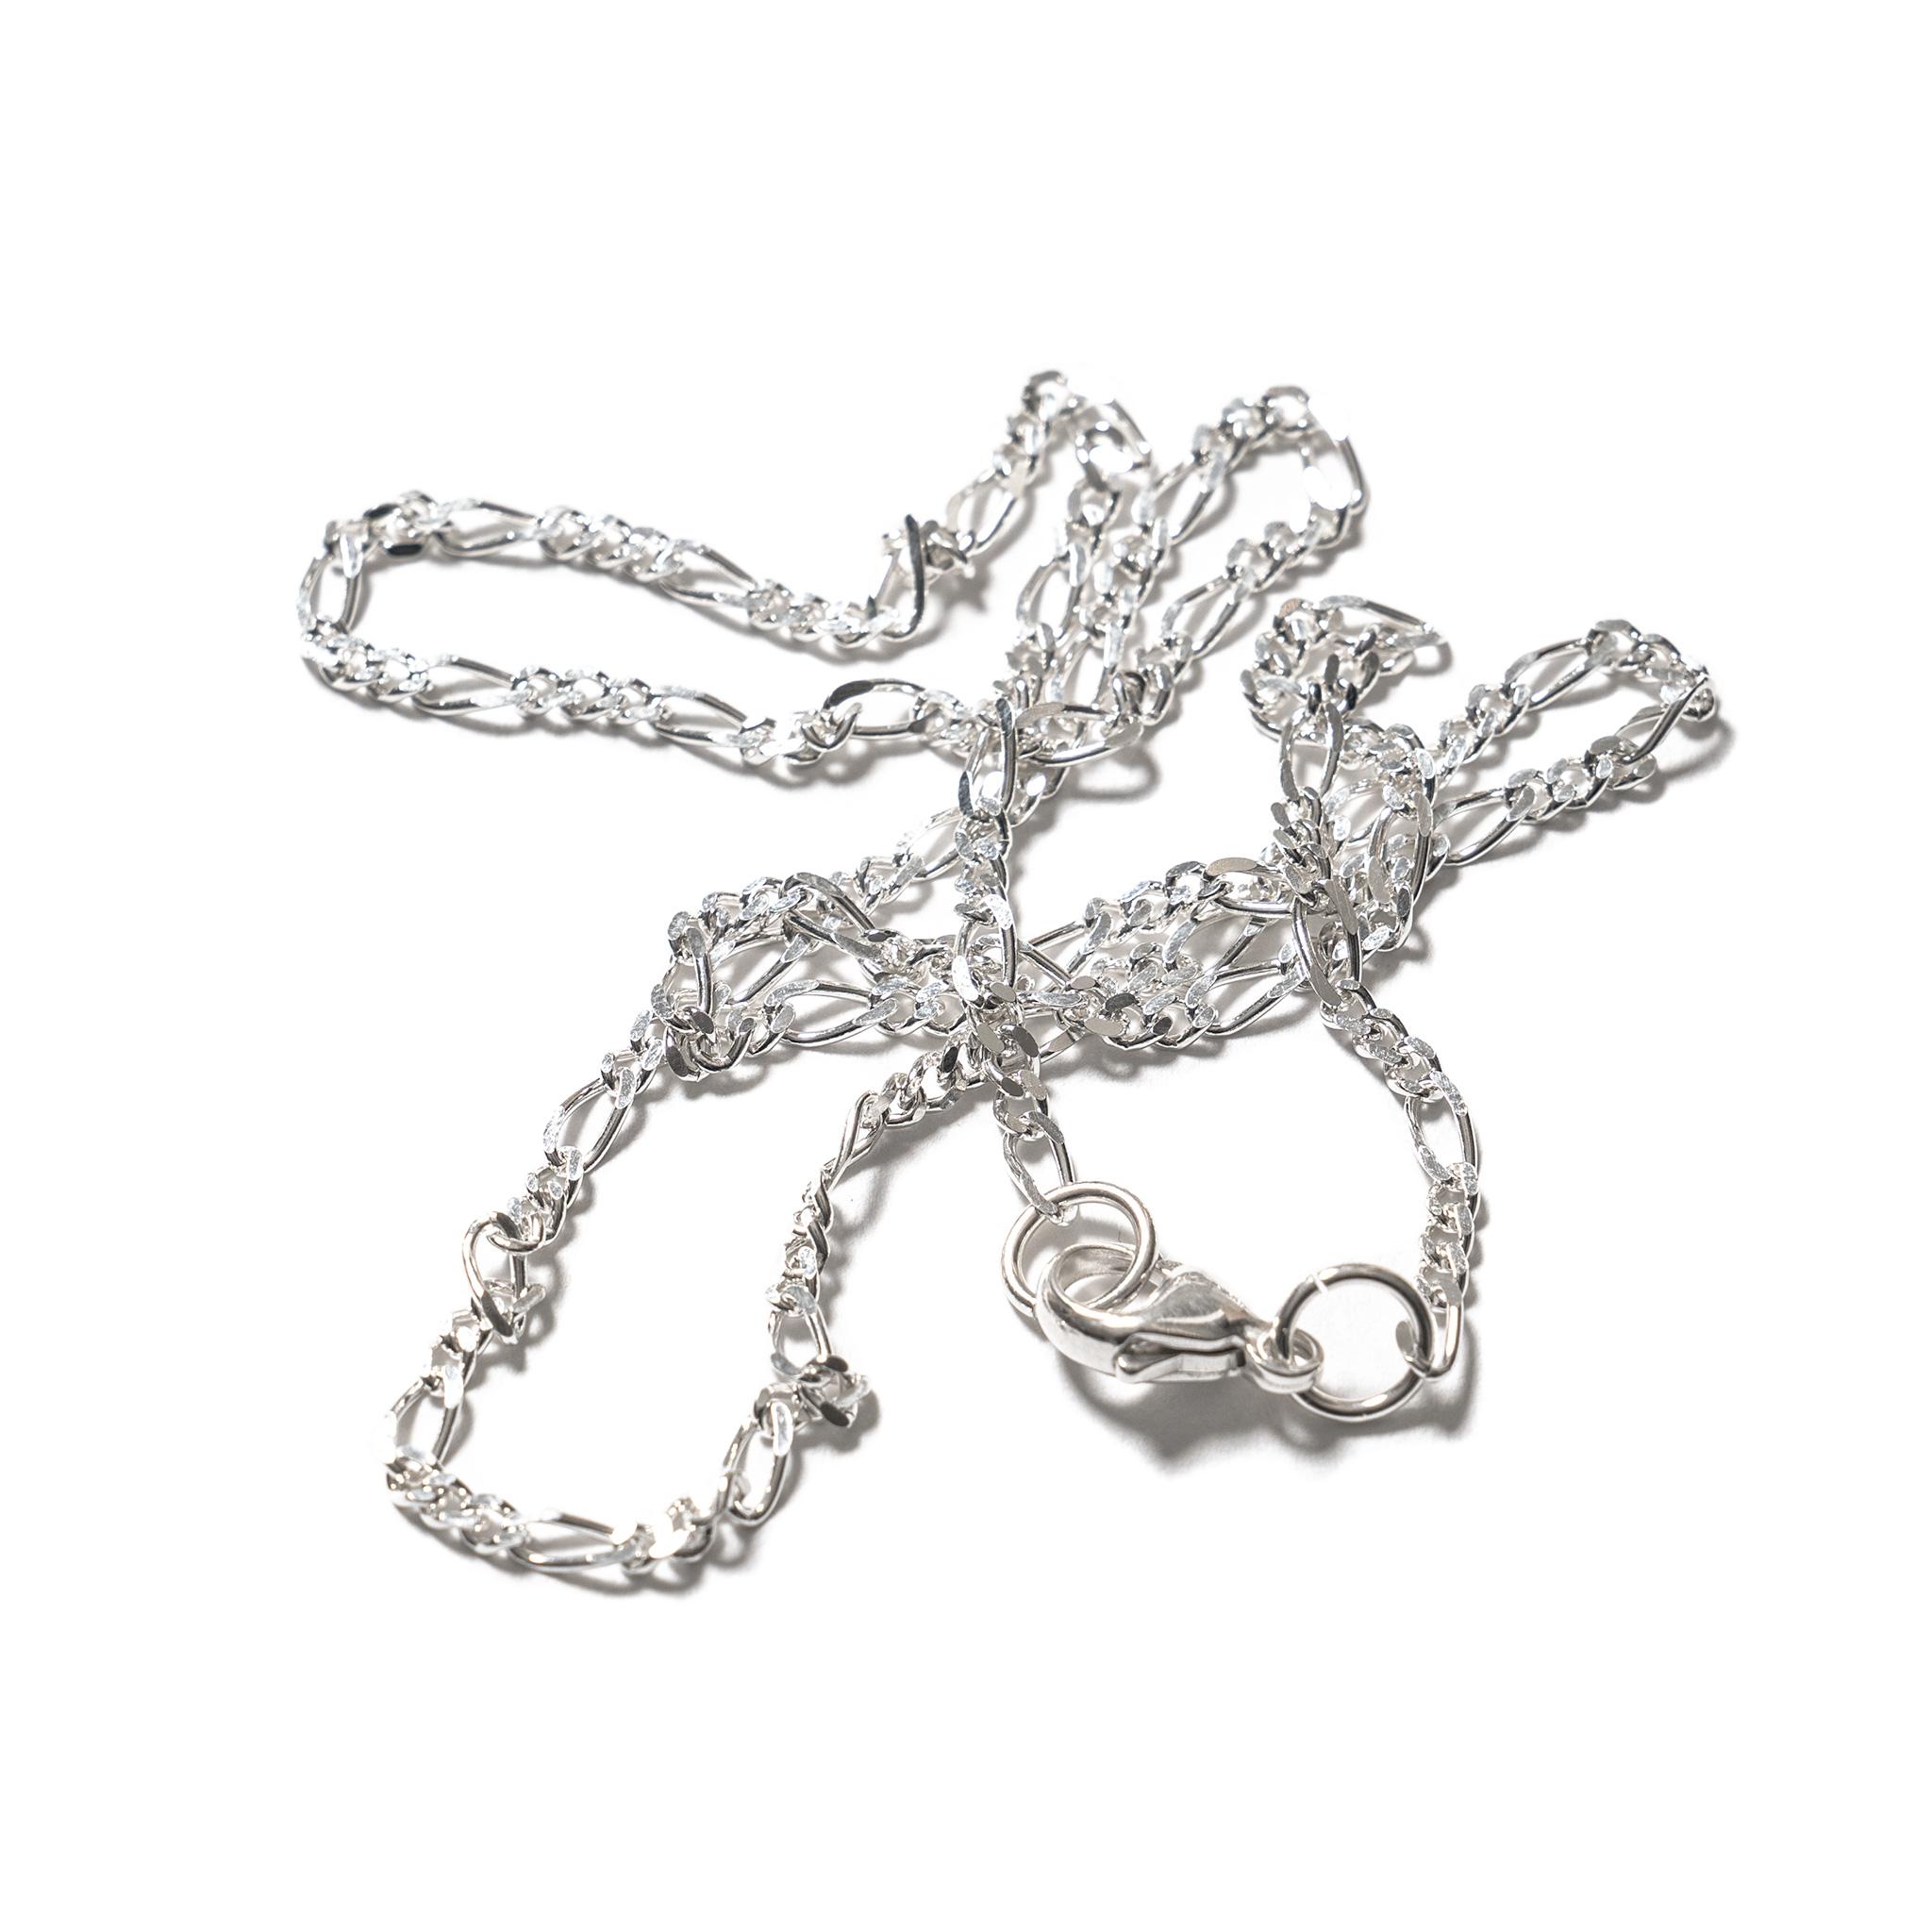 MAPLE-Figaro-Chain-Silver-925-2.jpg